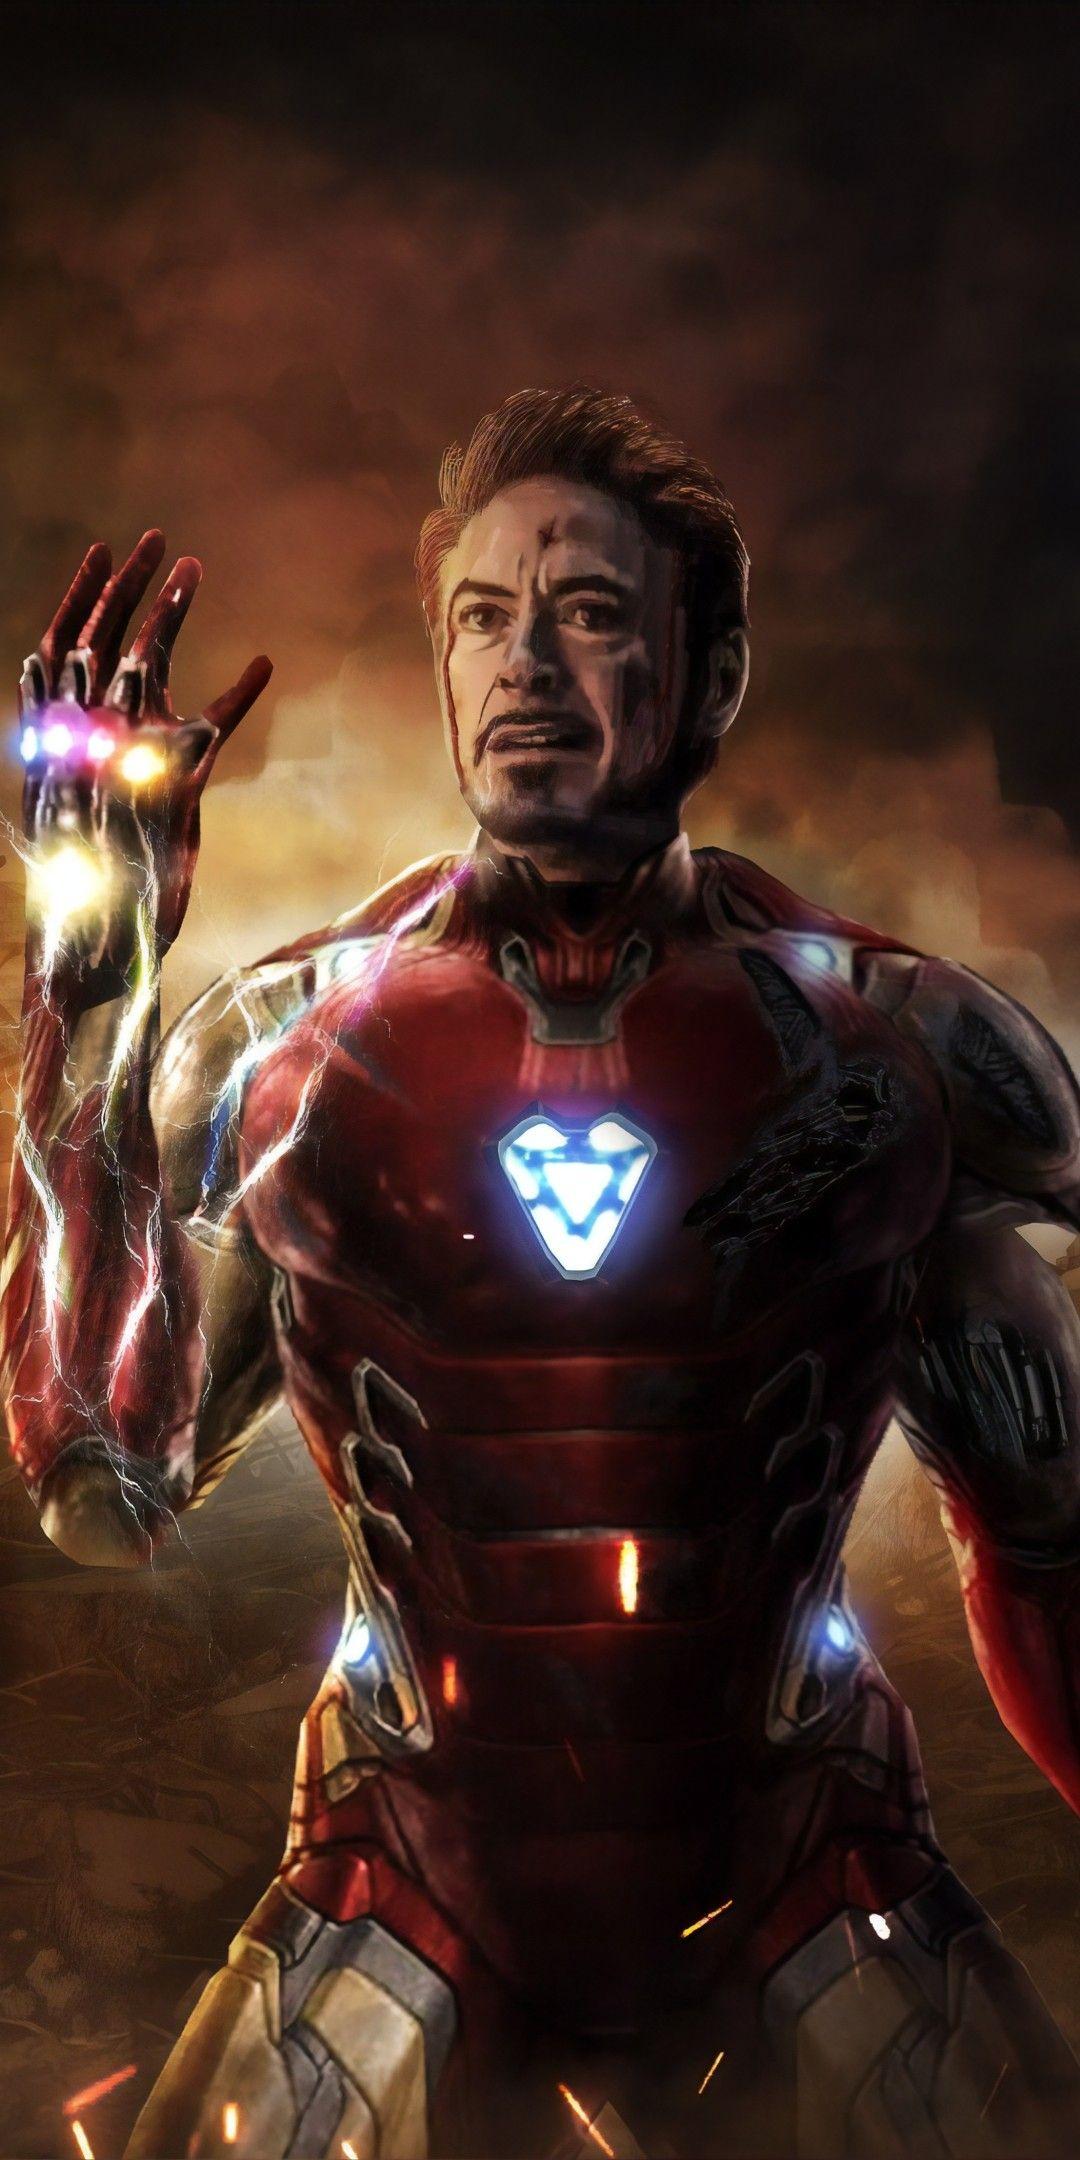 Love You 3000 Iron Man Avengers Iron Man Photos Iron Man Wallpaper